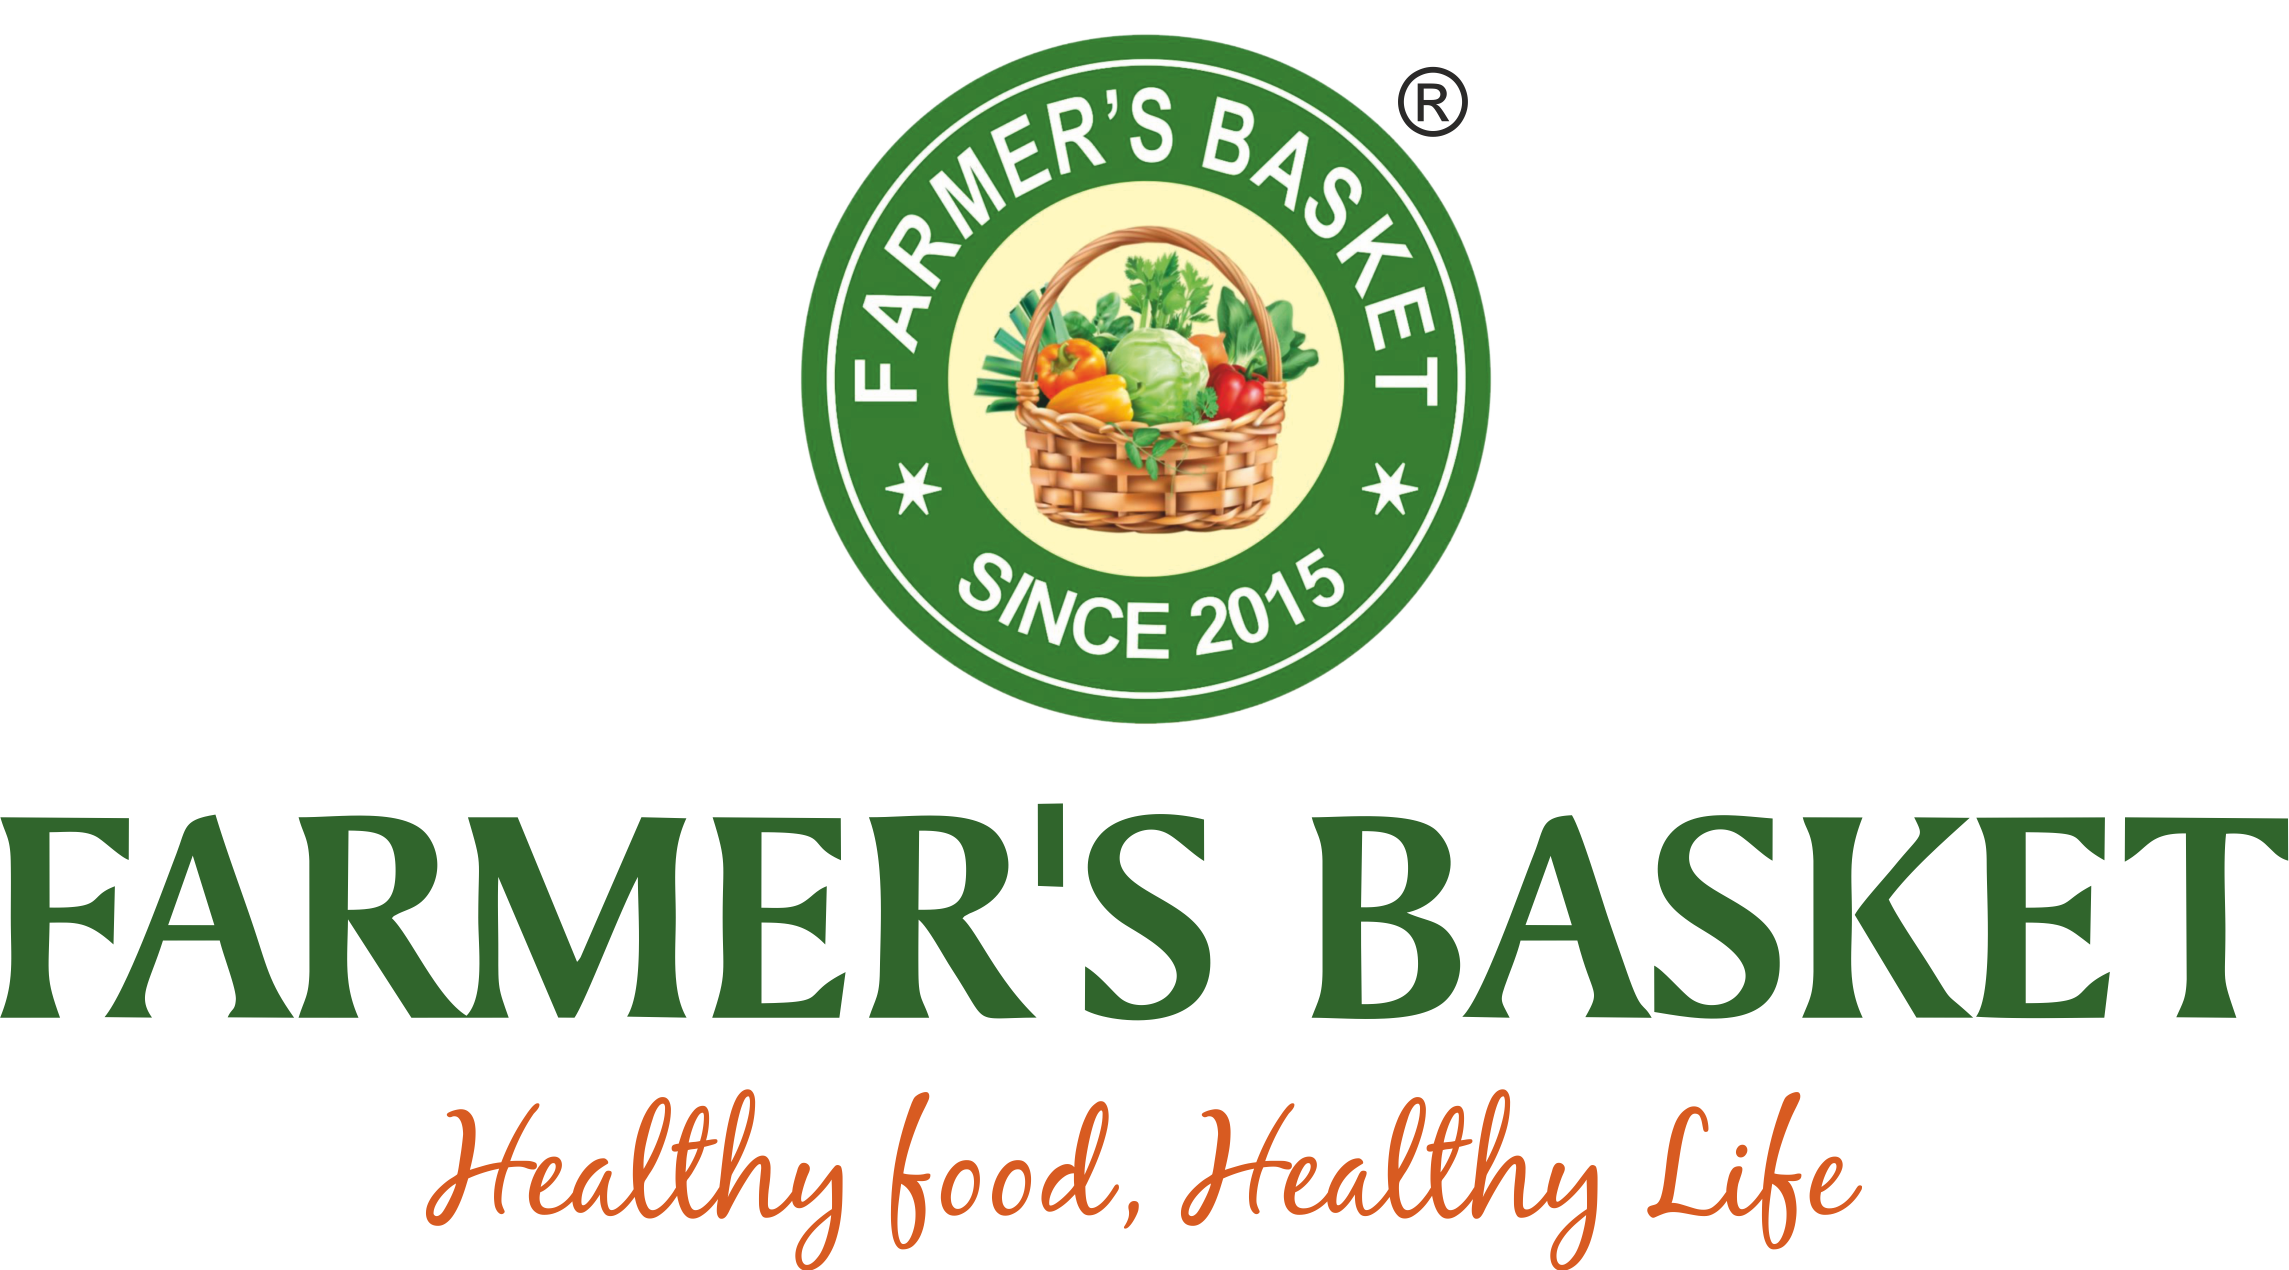 FARMER'S BASKET